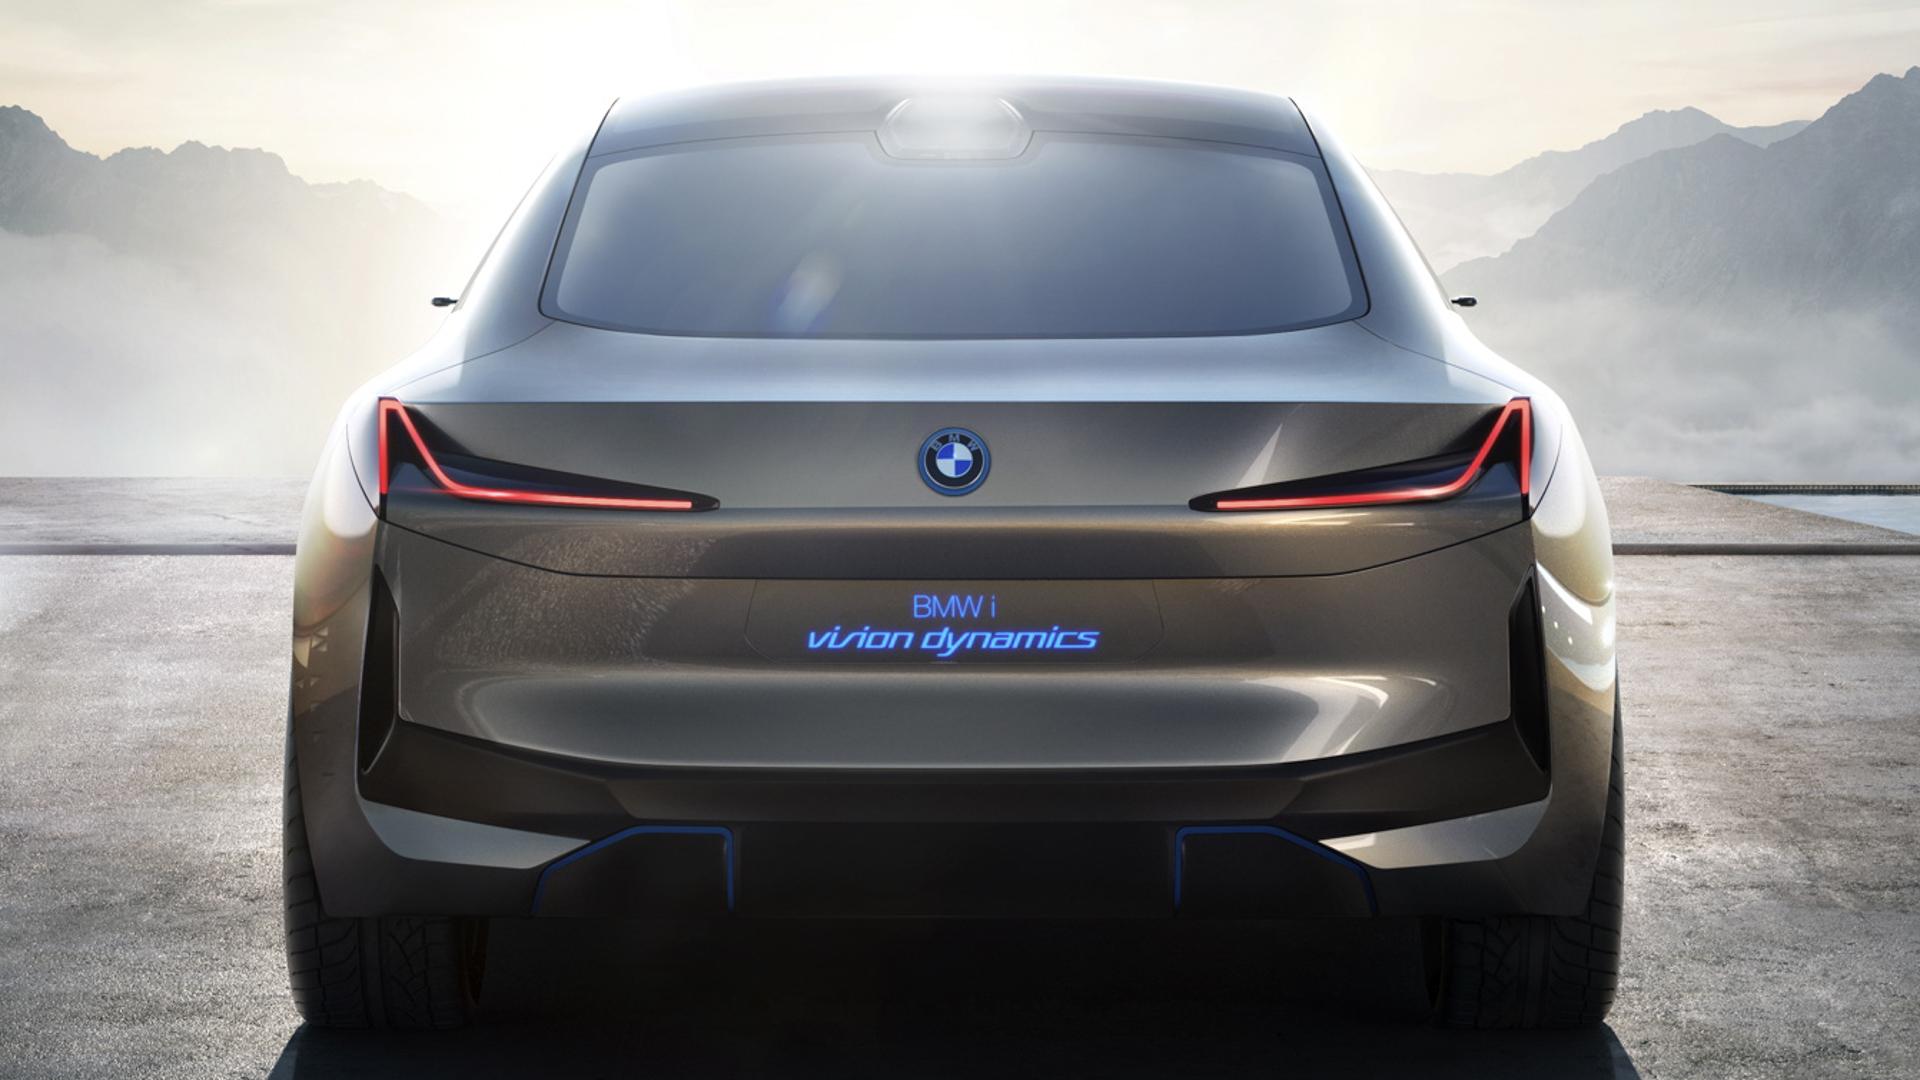 Audi e tron GT vs BMW i Vision Dynamics 12